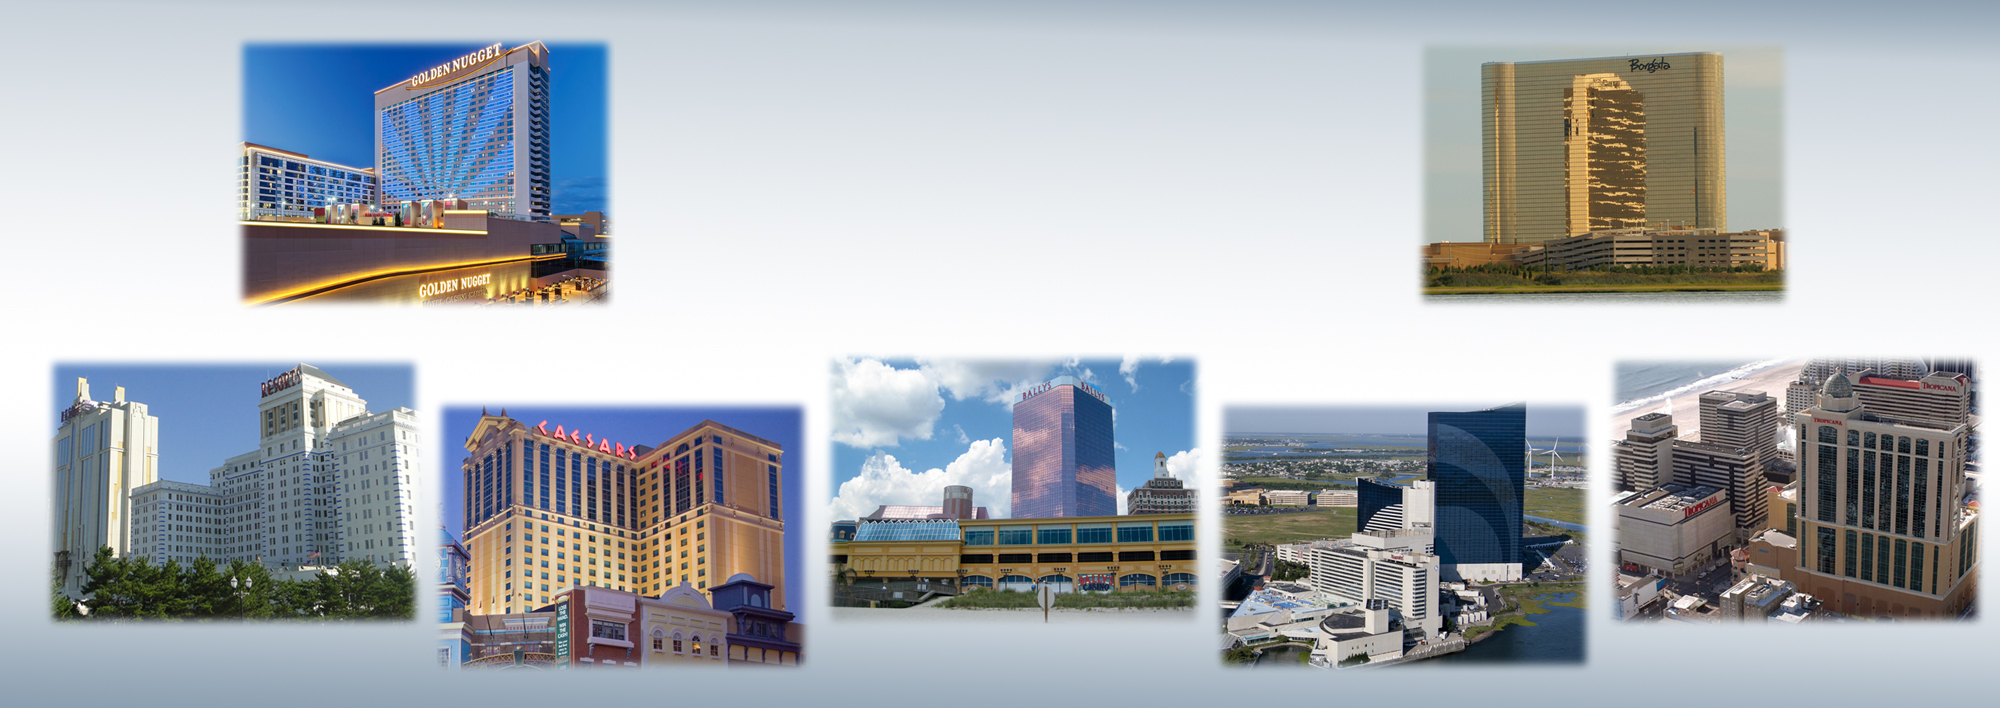 Nj casino service employee license st kitts hotel and casino